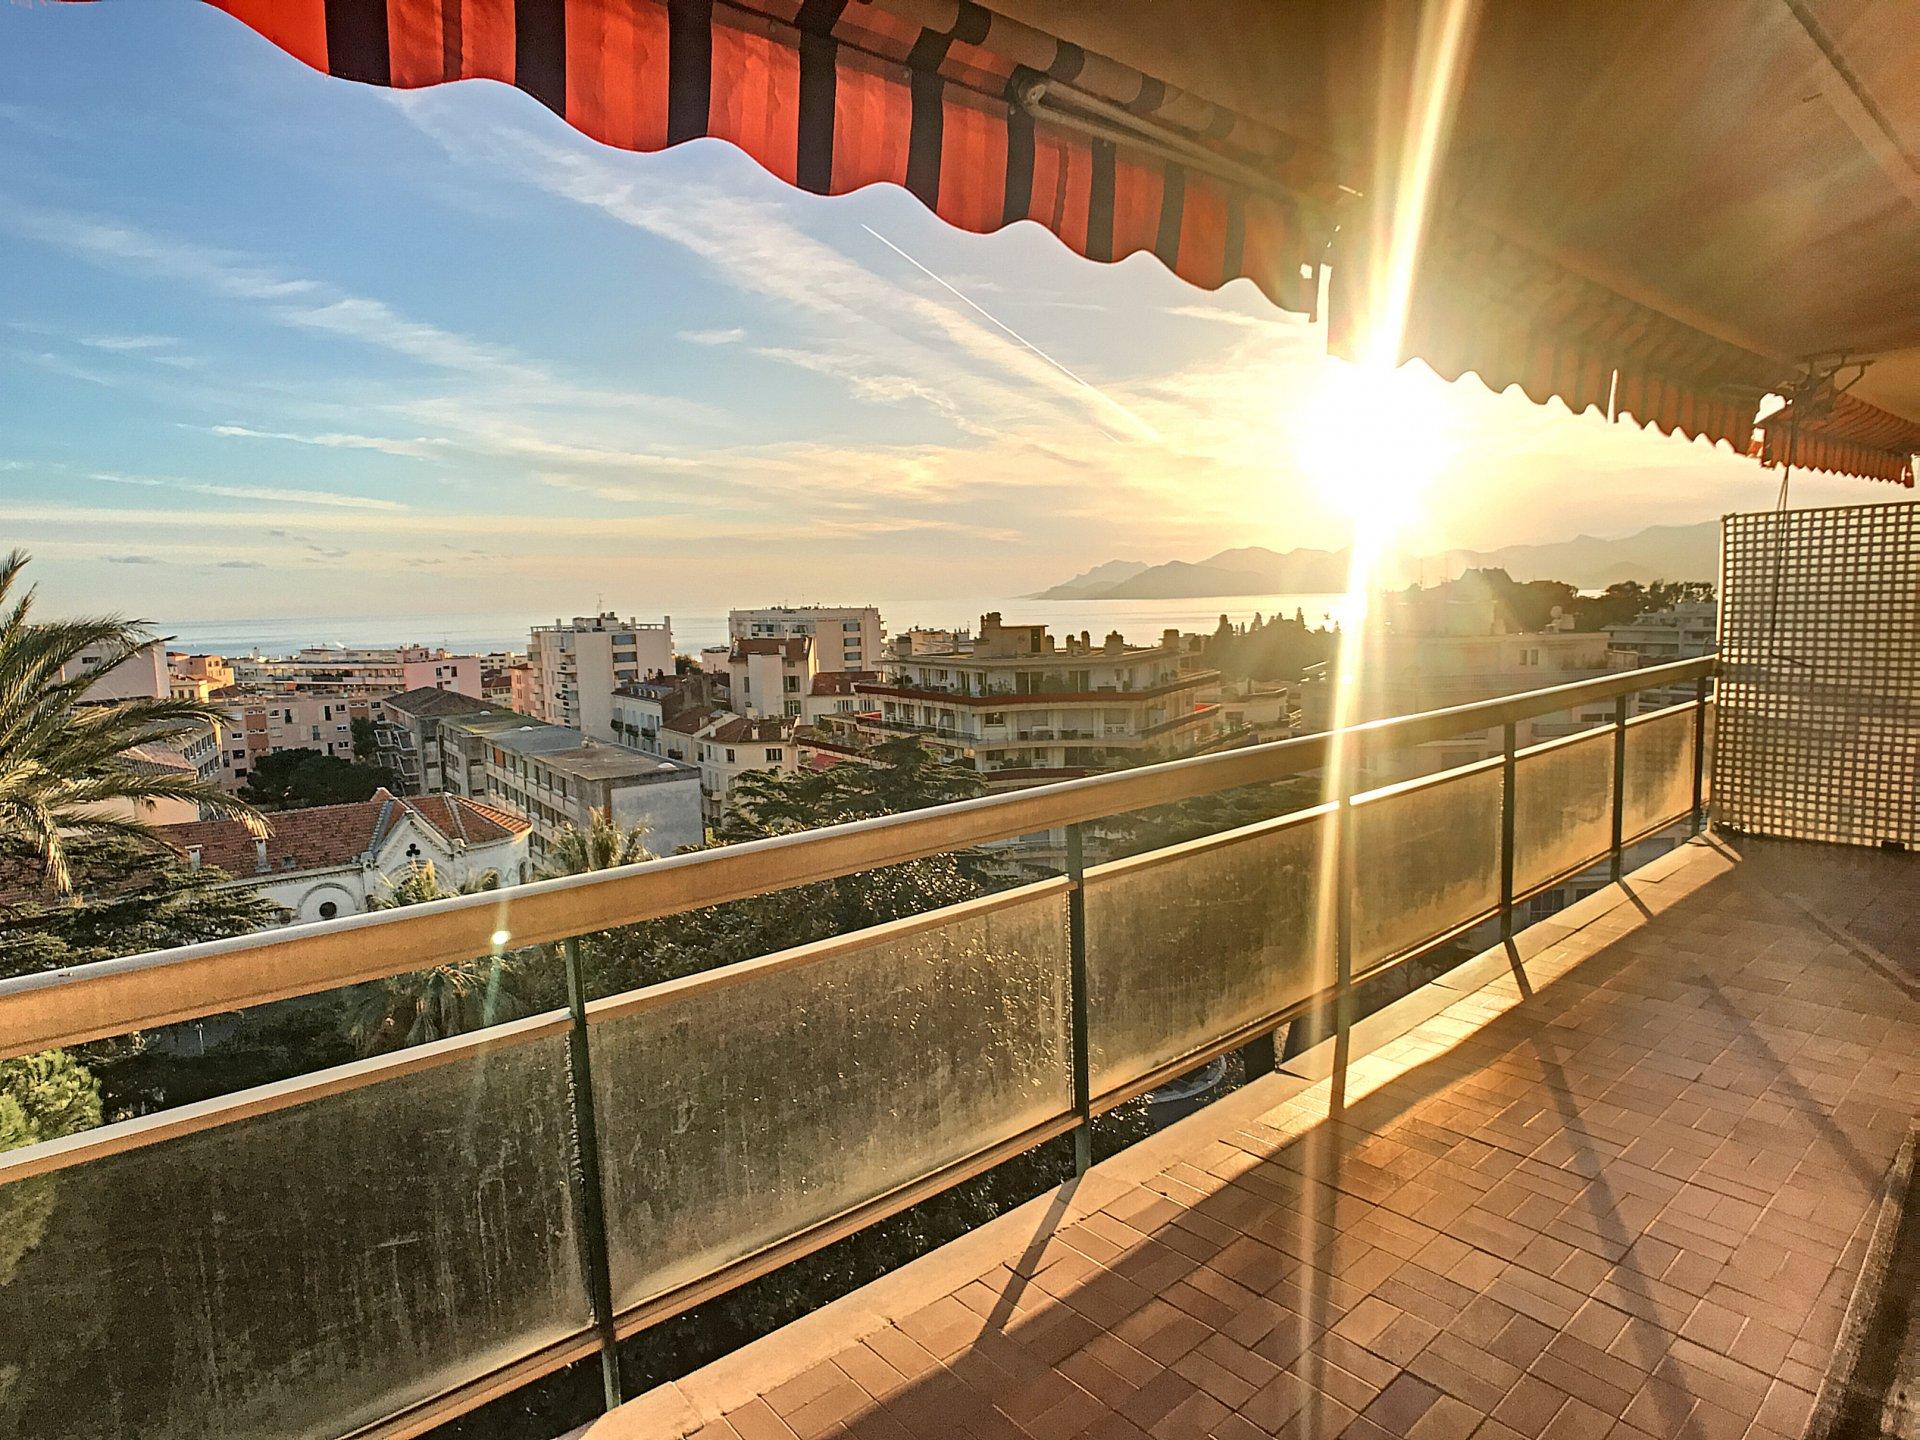 Cannes Stanislas, 3 bedroom panoramic seaview